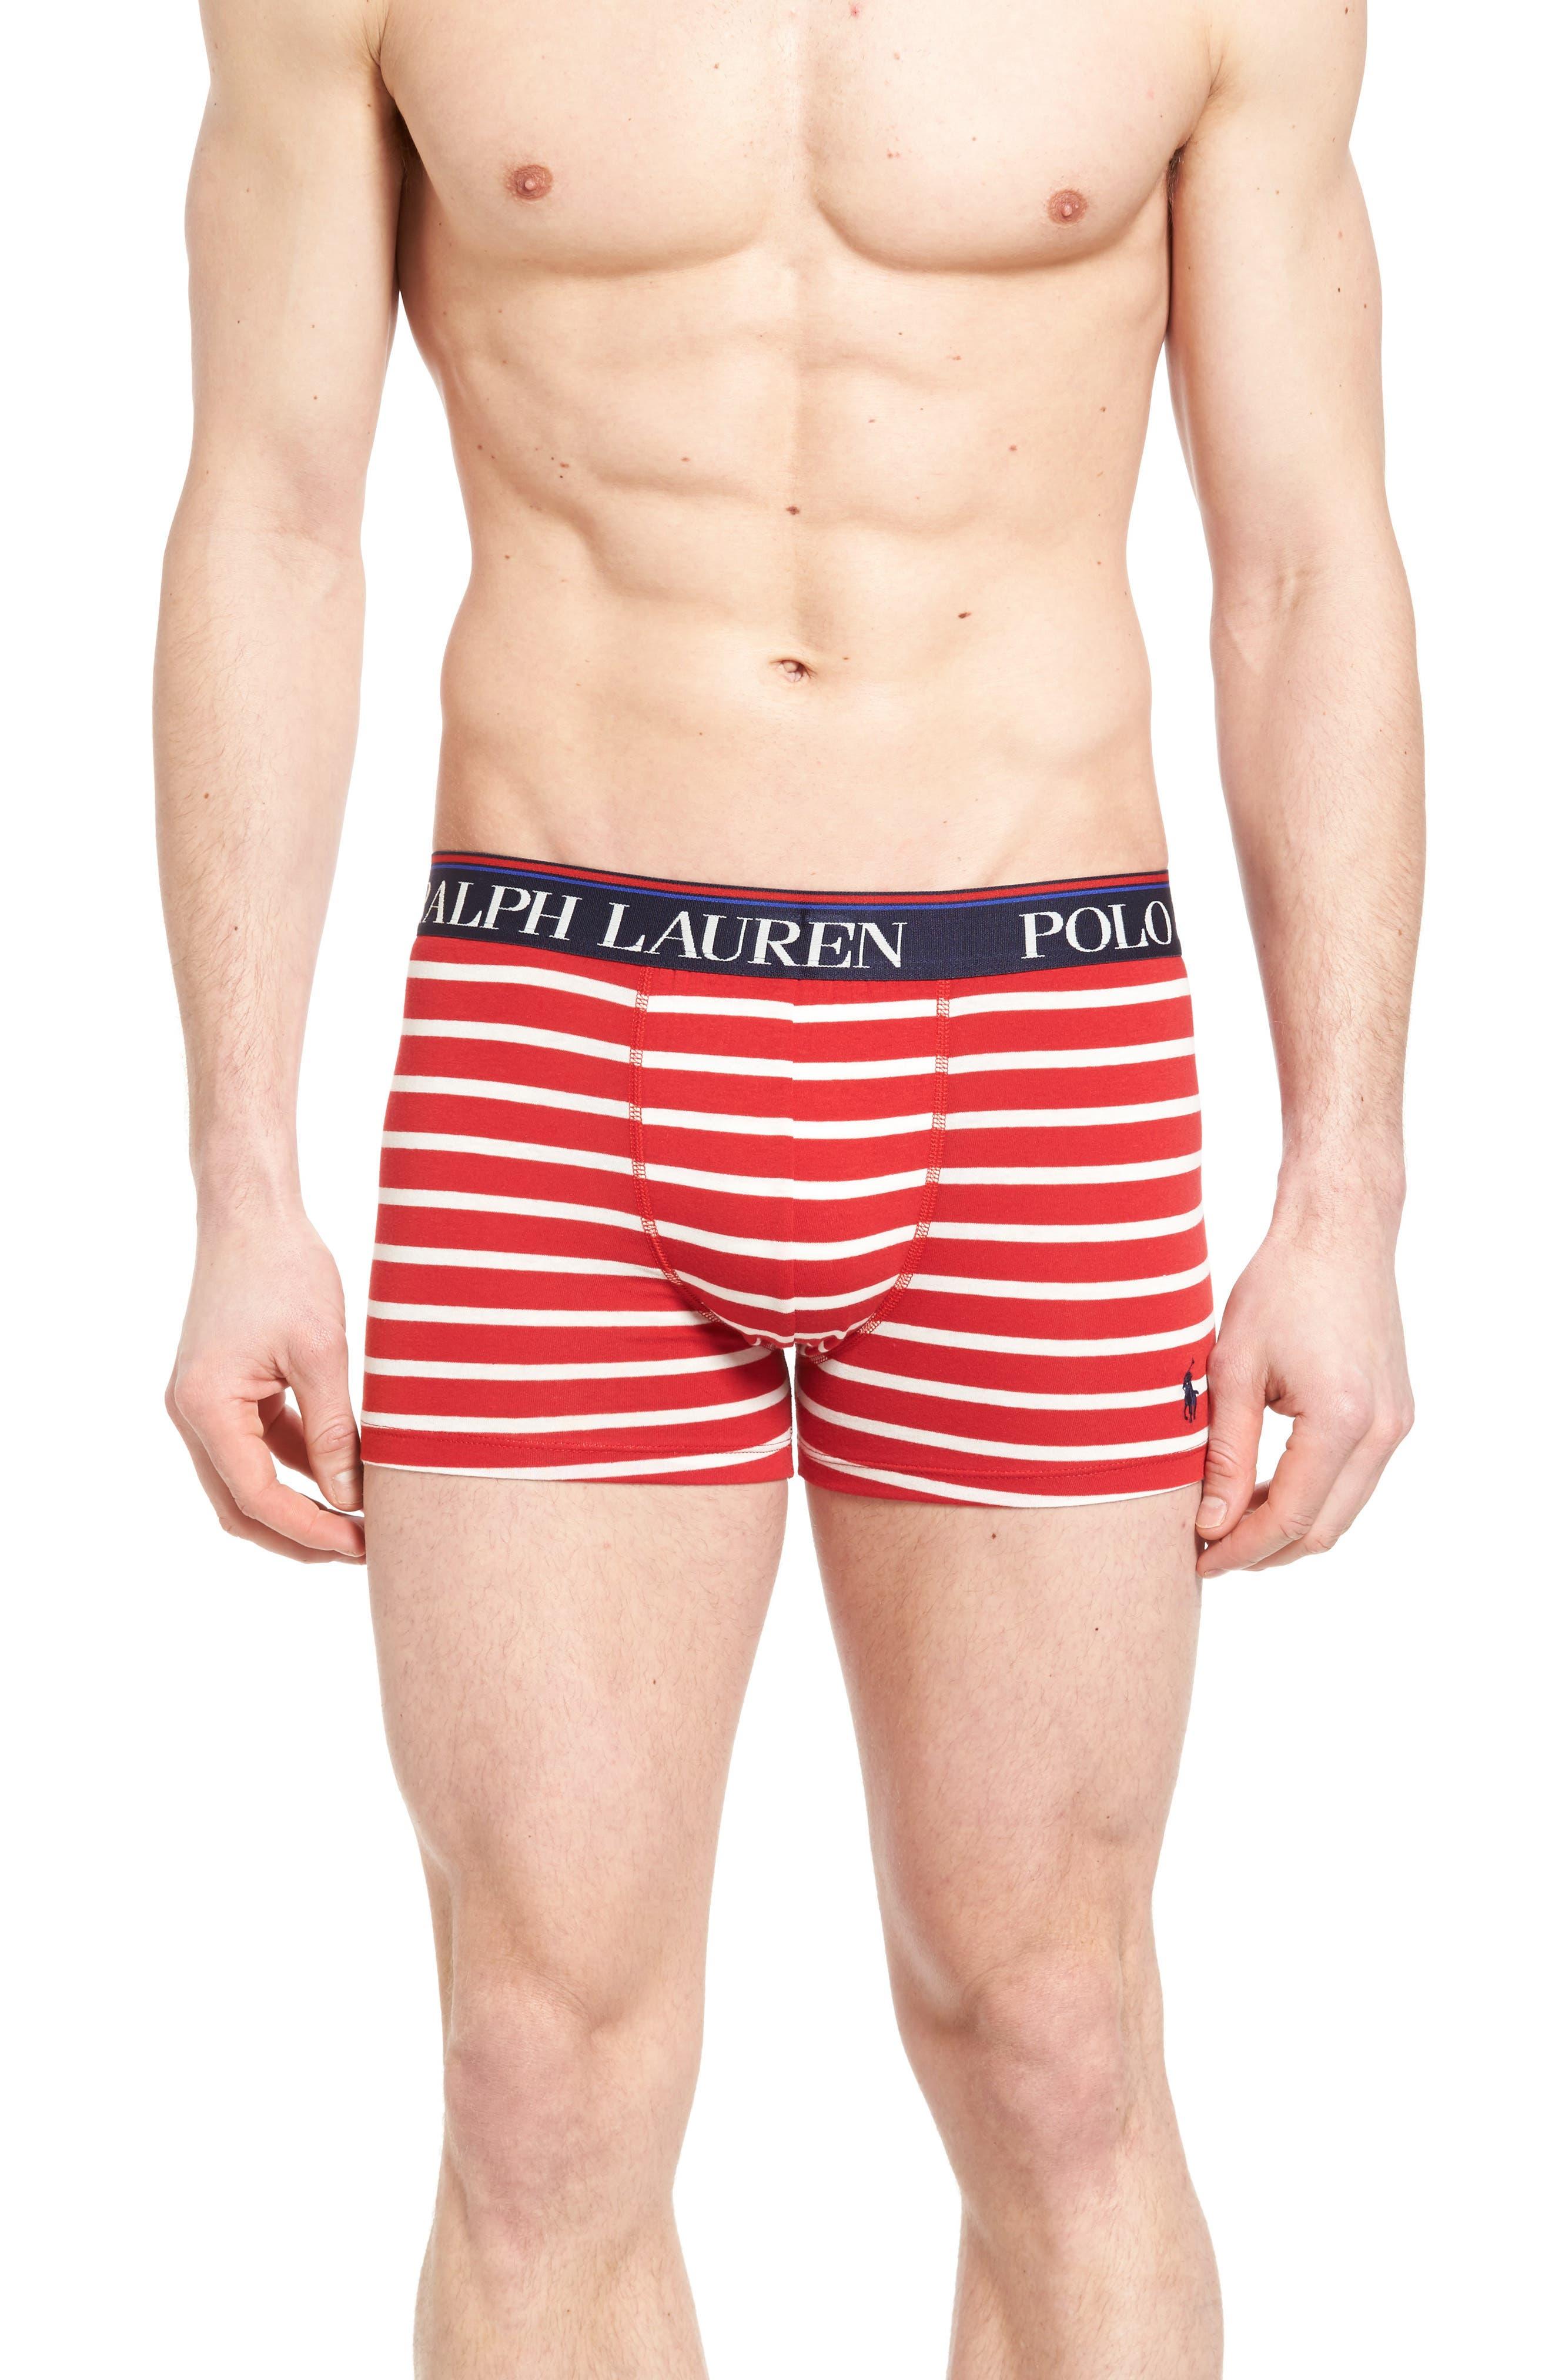 Polo Ralph Lauren Stretch Cotton Boxer Briefs